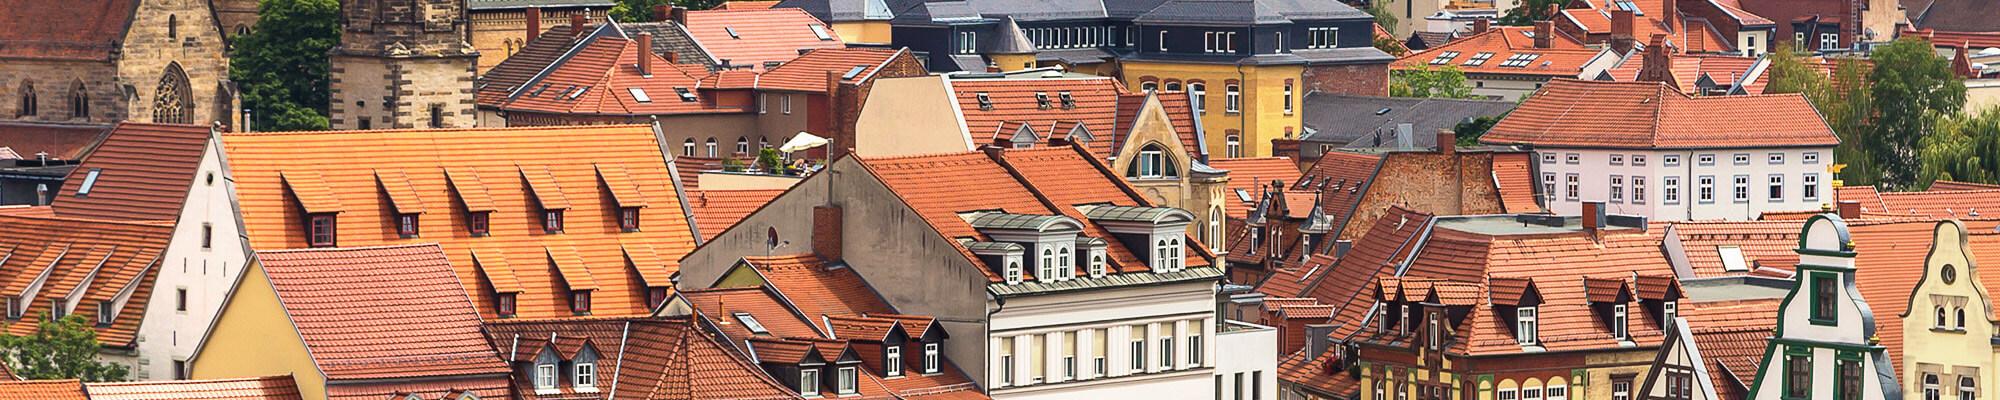 Erfurt-03